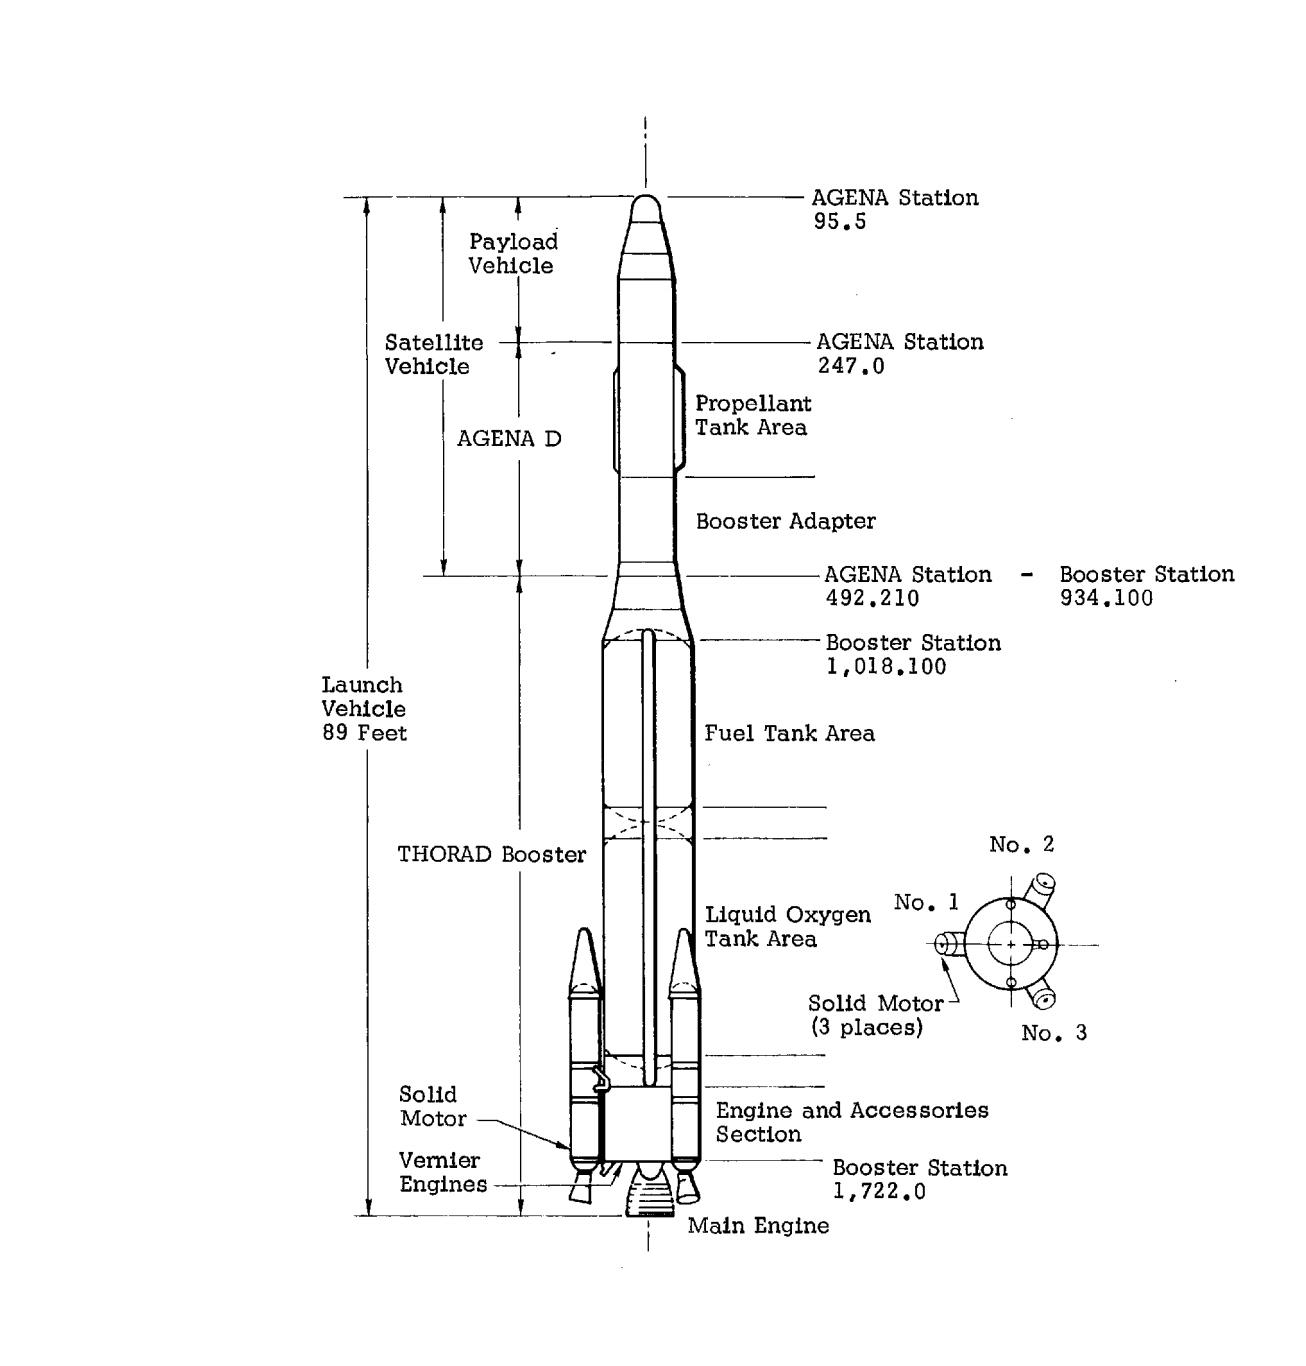 Corona: The Curious CIA Satellite That Used a Unique Lens